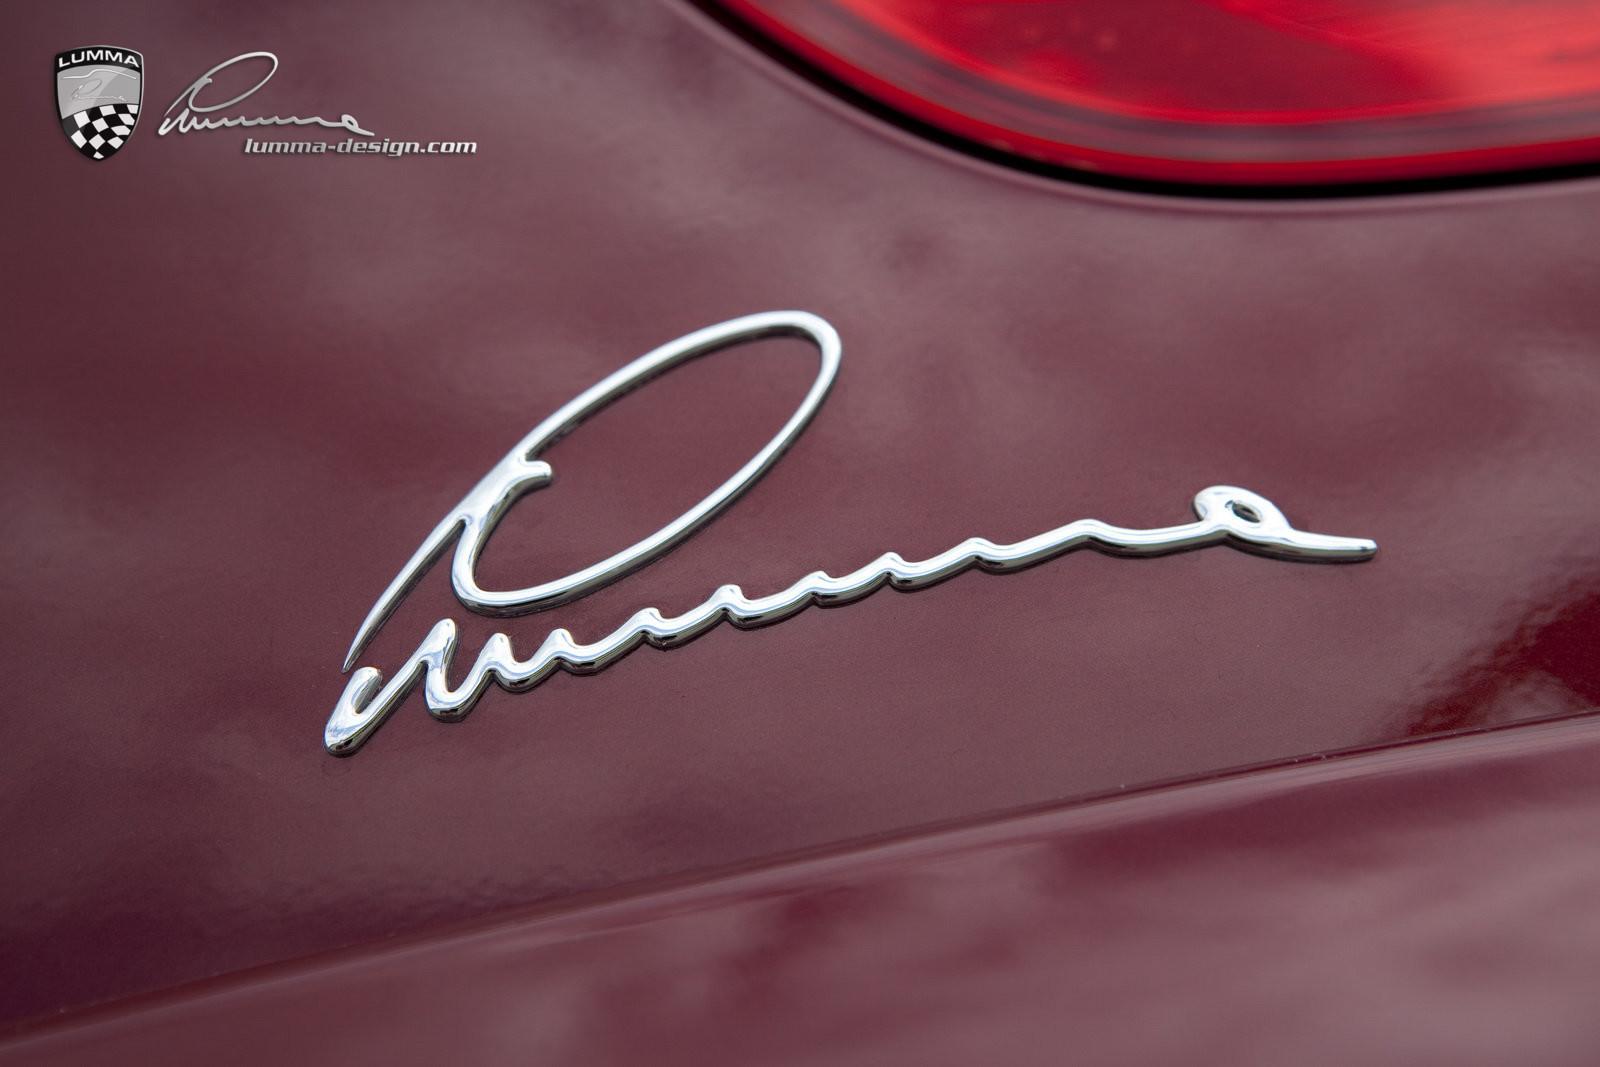 LUMMA CLR X 650 BODY KITS FOR BMW X6 50I E71 NEW MODEL